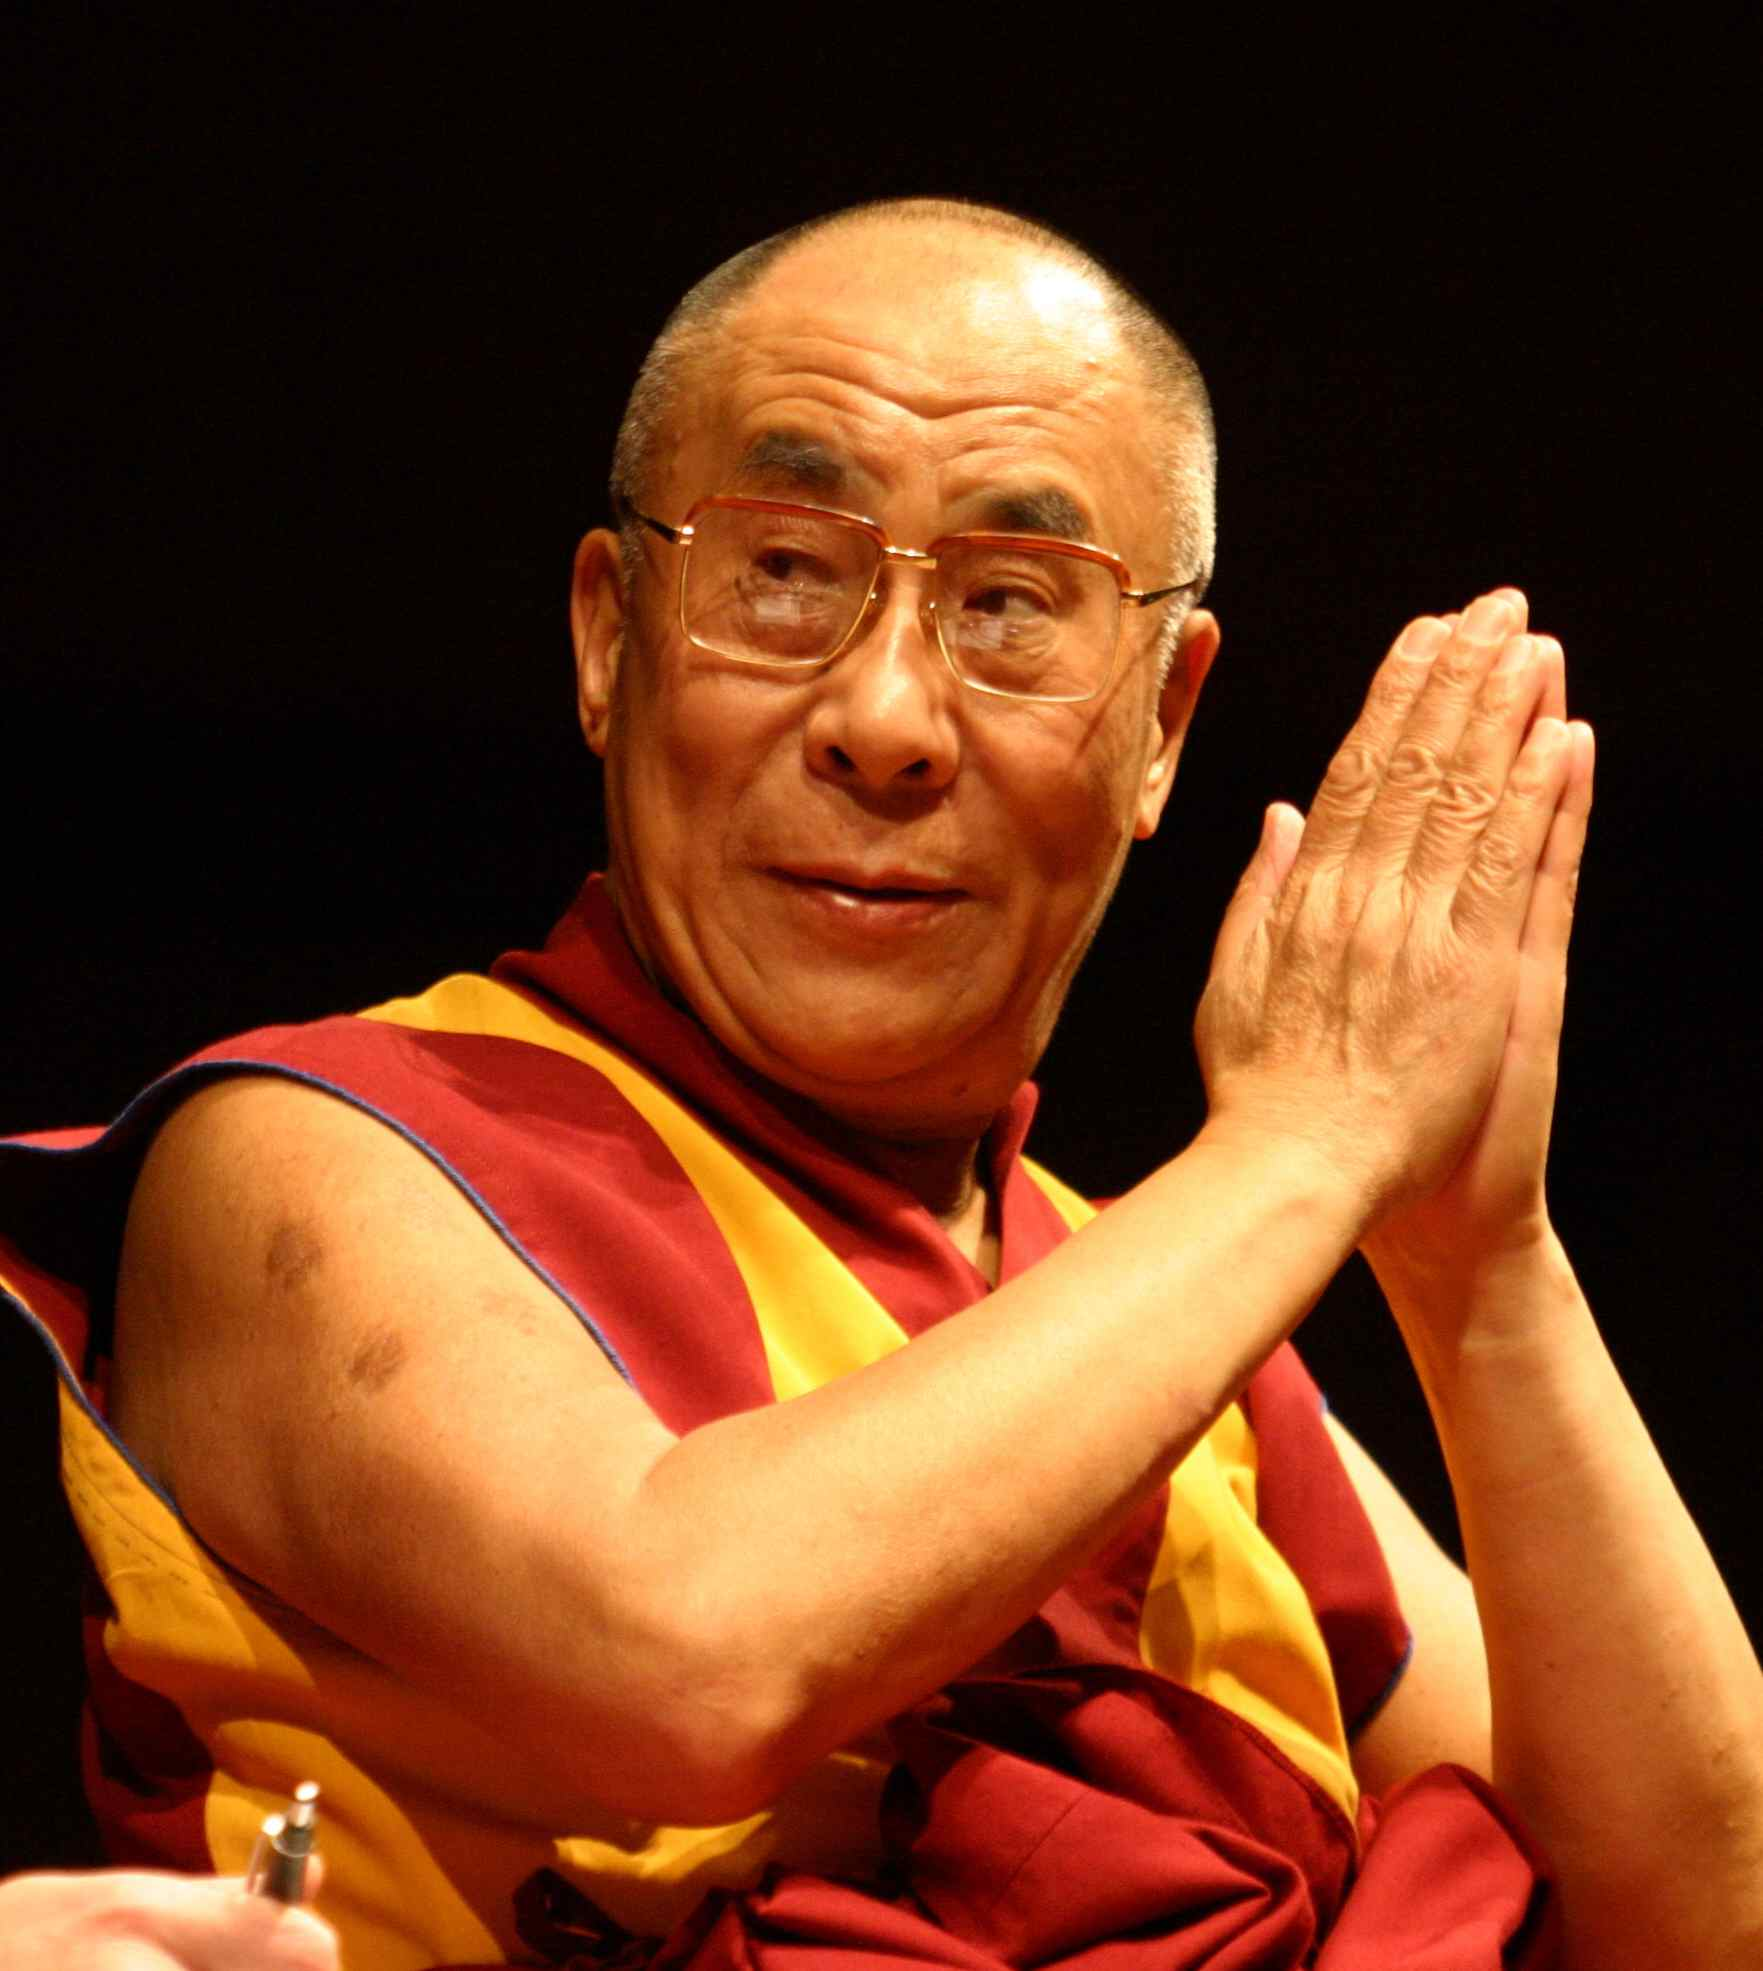 Buddhizmus Buddhista Gal ria Buddhist Gallery The Dalai Lama